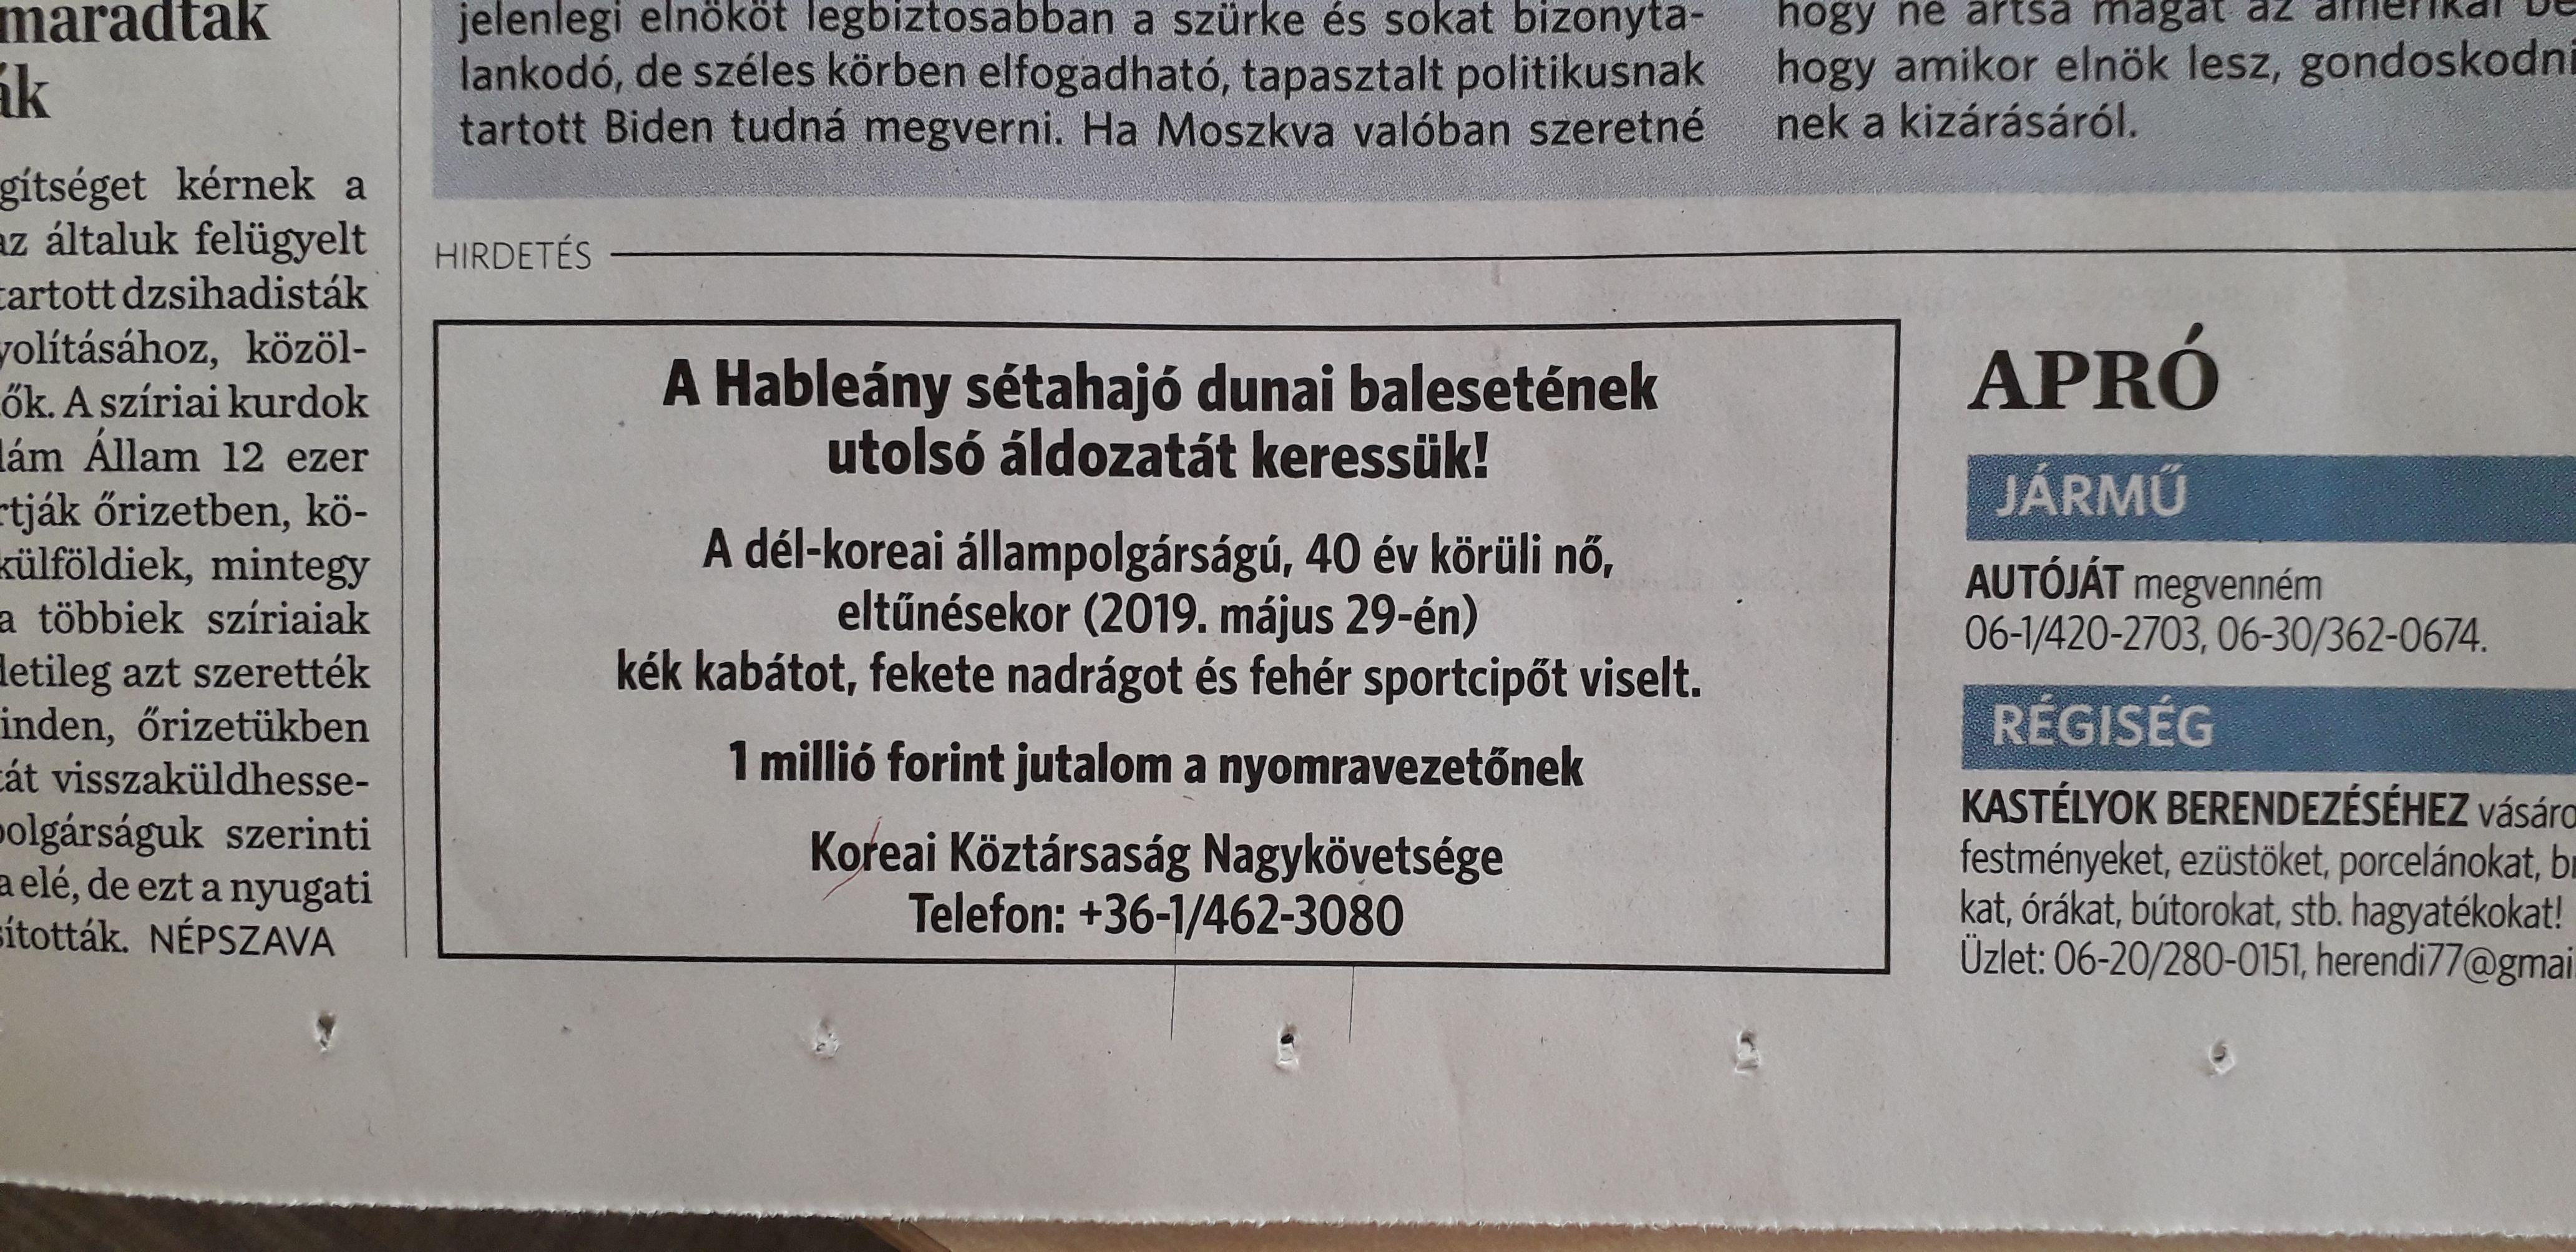 Tueåsen hyttefelt, Båstad (Indre Østfold), Lund – legfrissebb árai